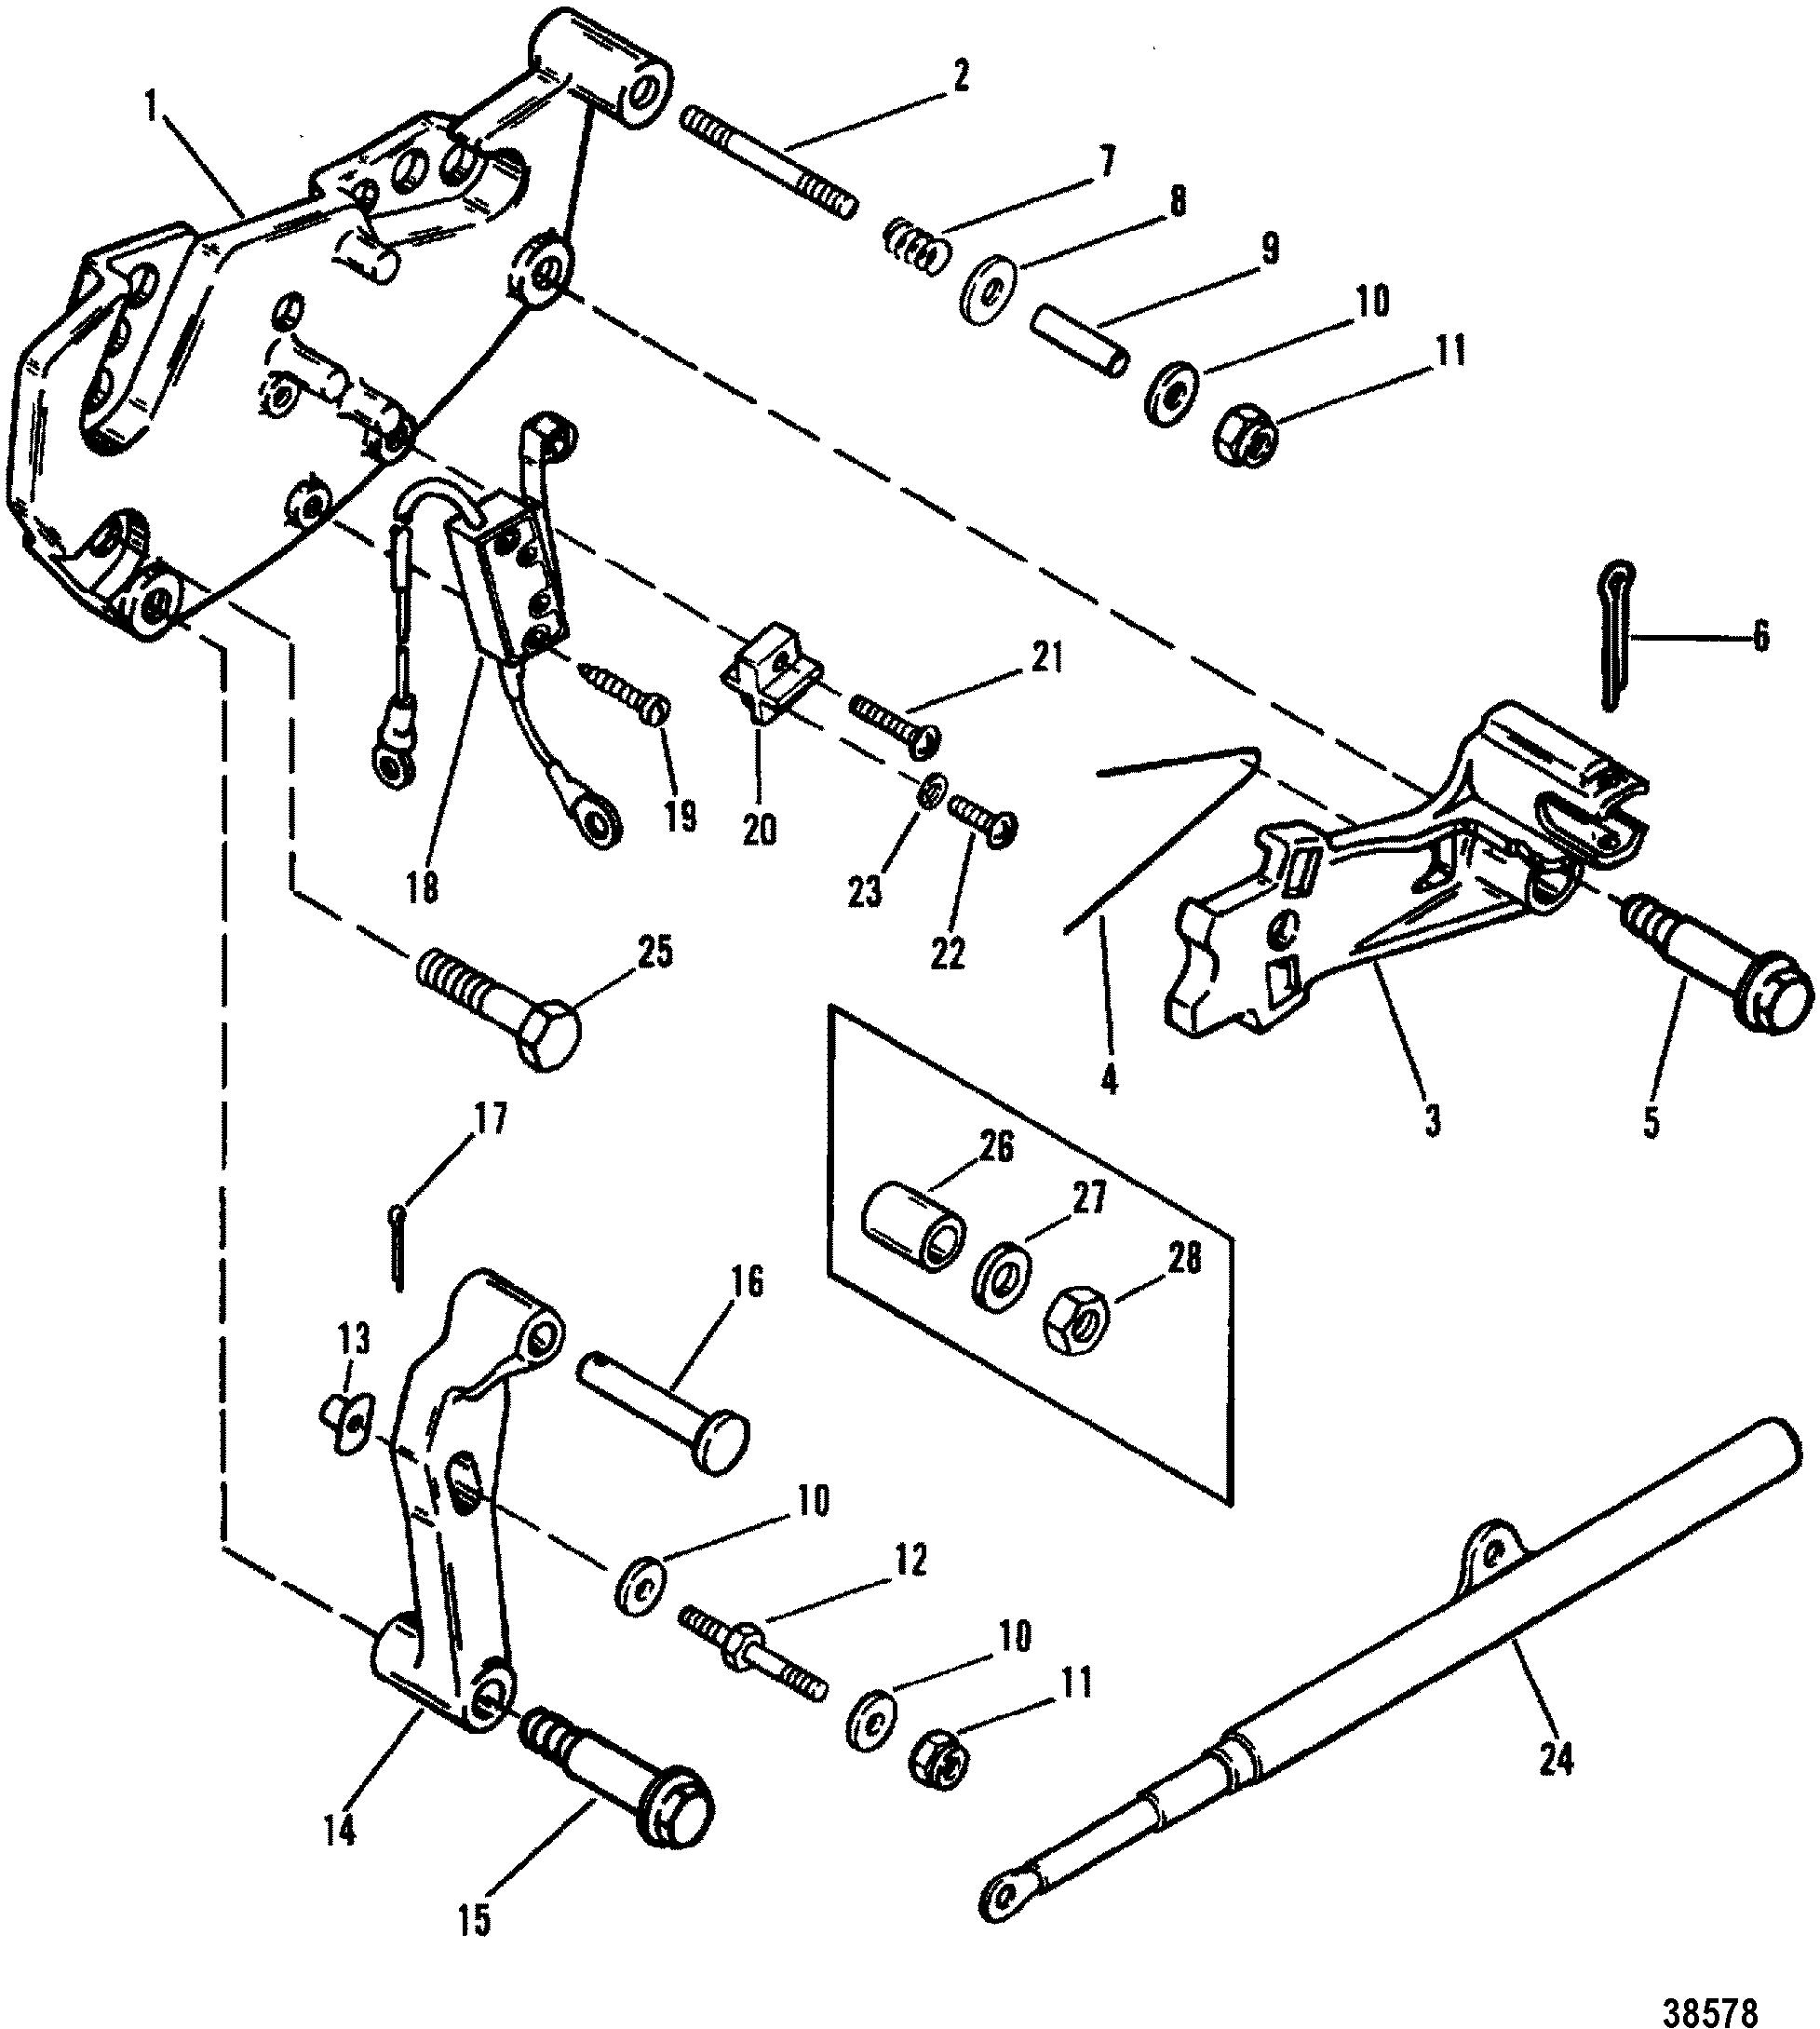 КатаРог запчастей mercruiser остаРьные 5 7l gm 350 v 8 1988 1995 shift bracket alpha engines